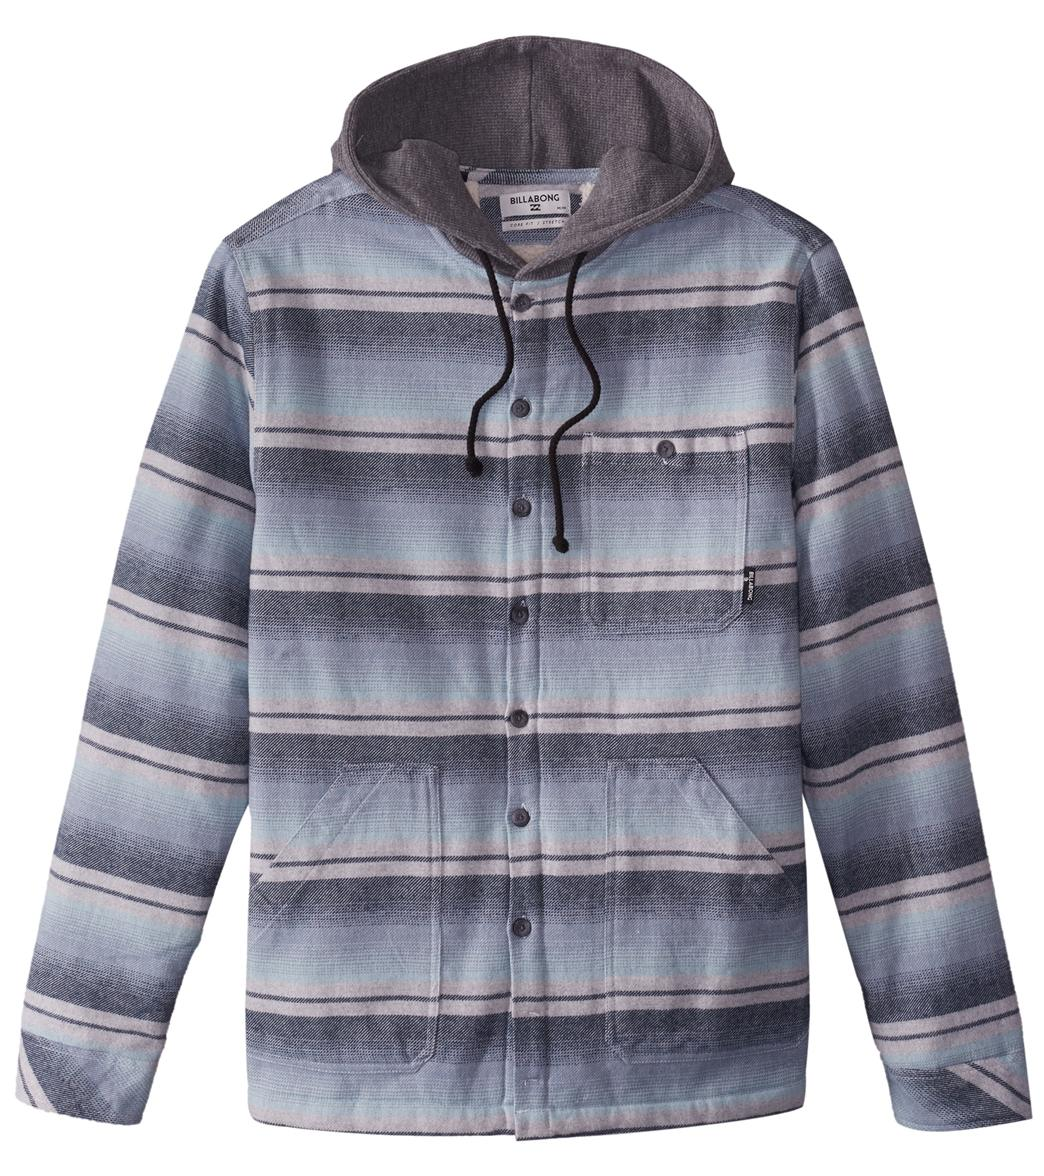 Billabong Men s Baja Sherpa Lined Flannel Shirt at SwimOutlet.com - Free  Shipping 20be1350d4d